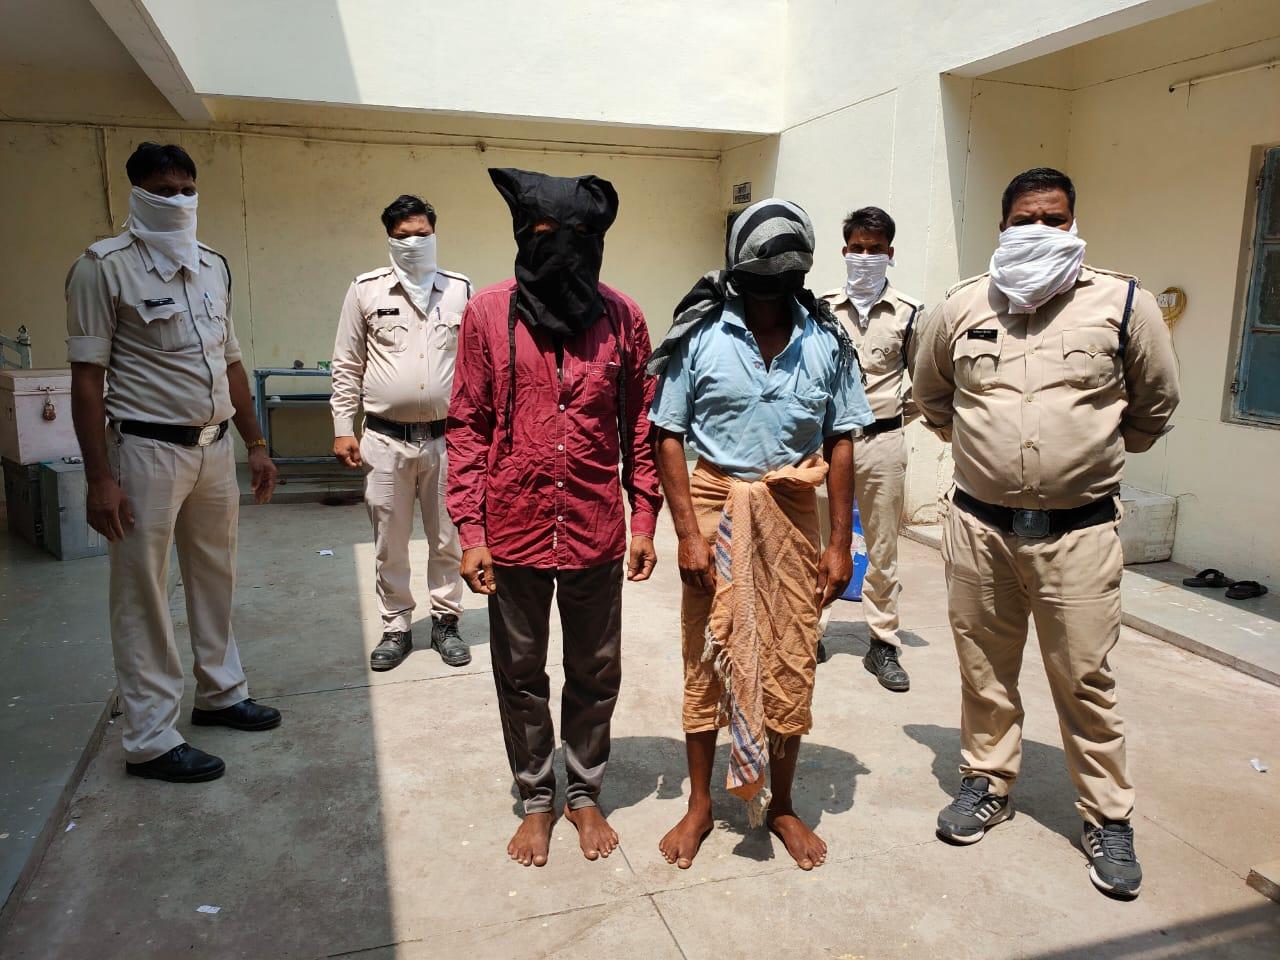 Jhabua News- लूट डकैती के कुख्यात आरोपी गिरफ्तार